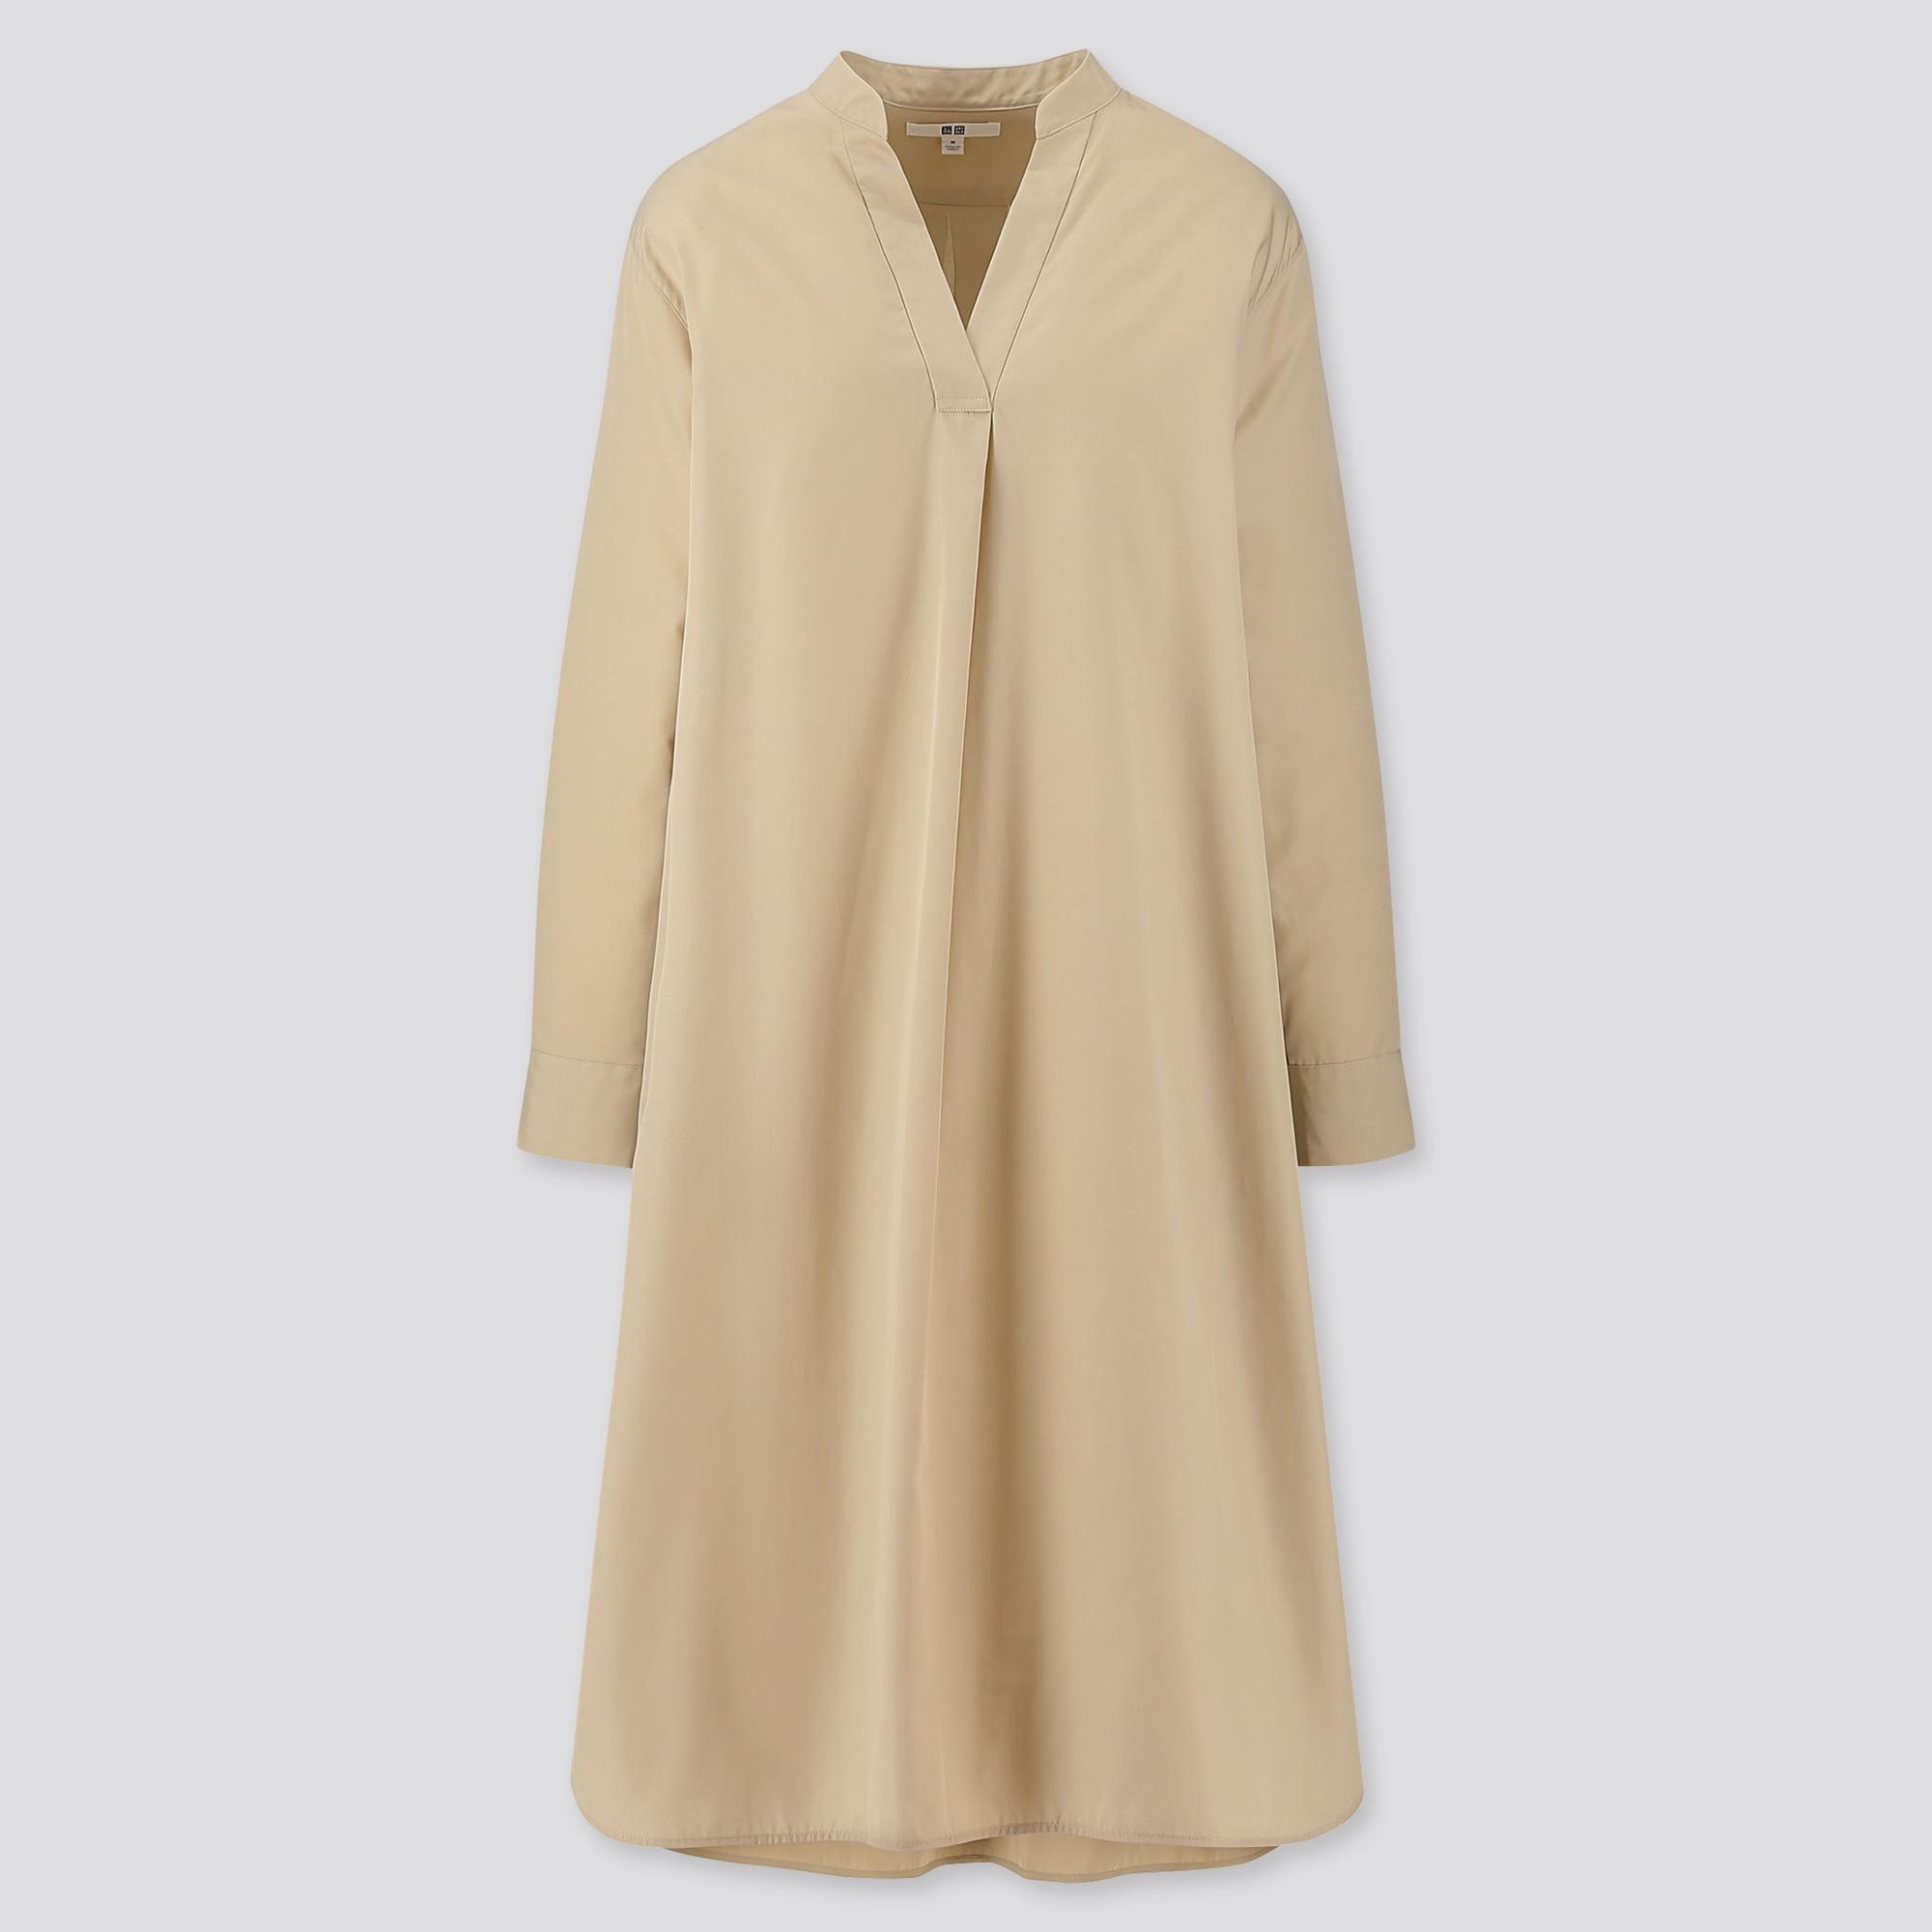 WOMEN EXTRA FINE COTTON SPLIT NECK A-LINE LONG-SLEEVE DRESS